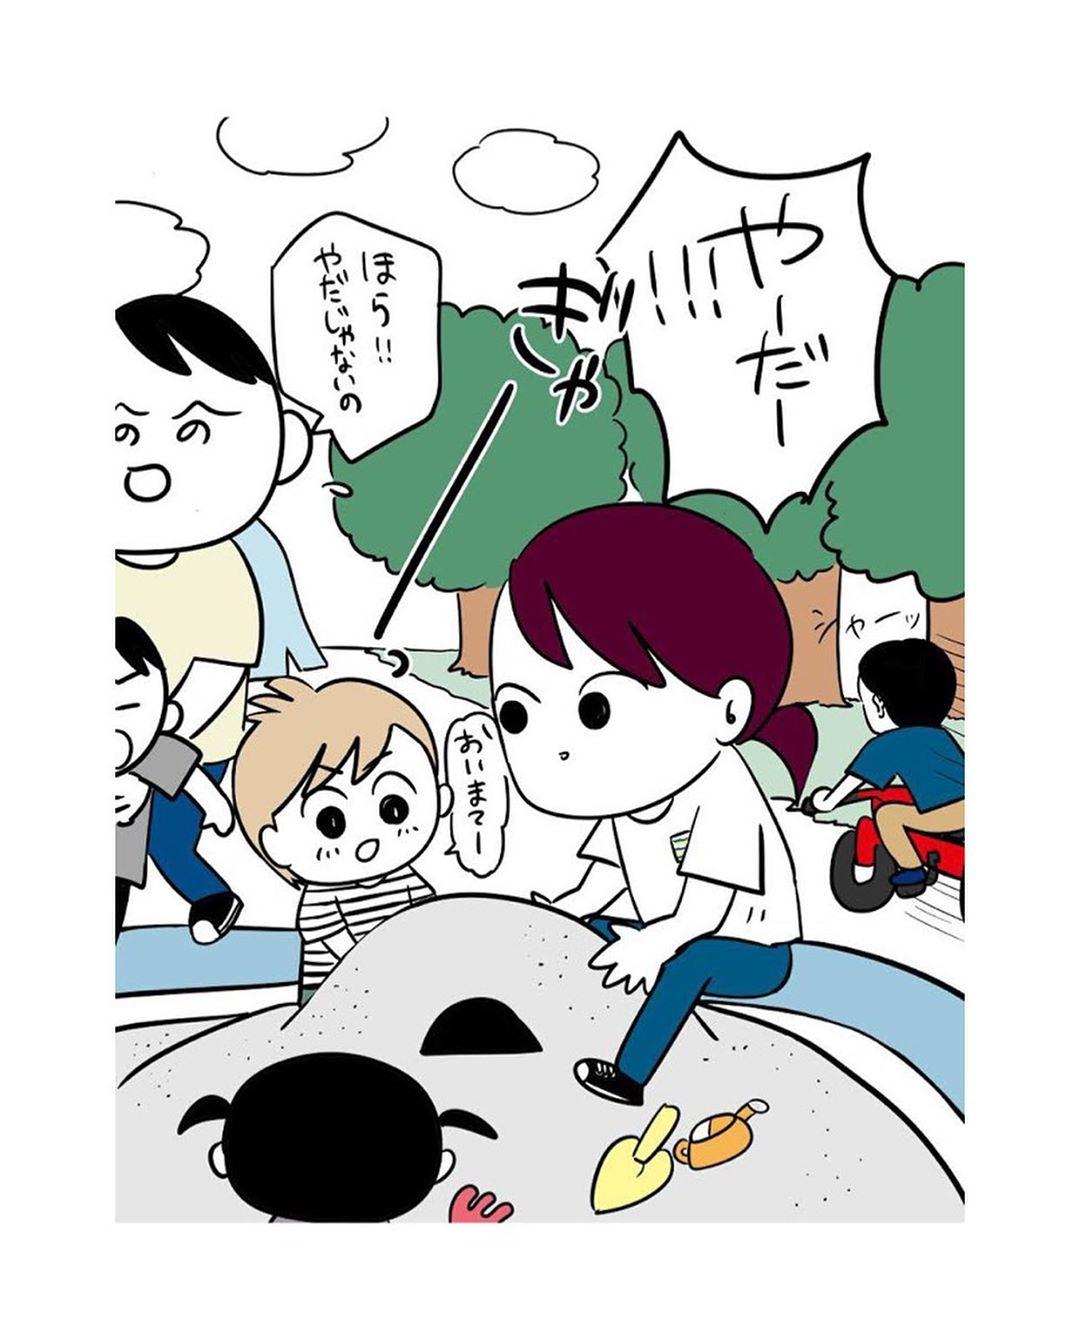 shirota.yunya_71963346_150418312884392_8414198511058409638_n